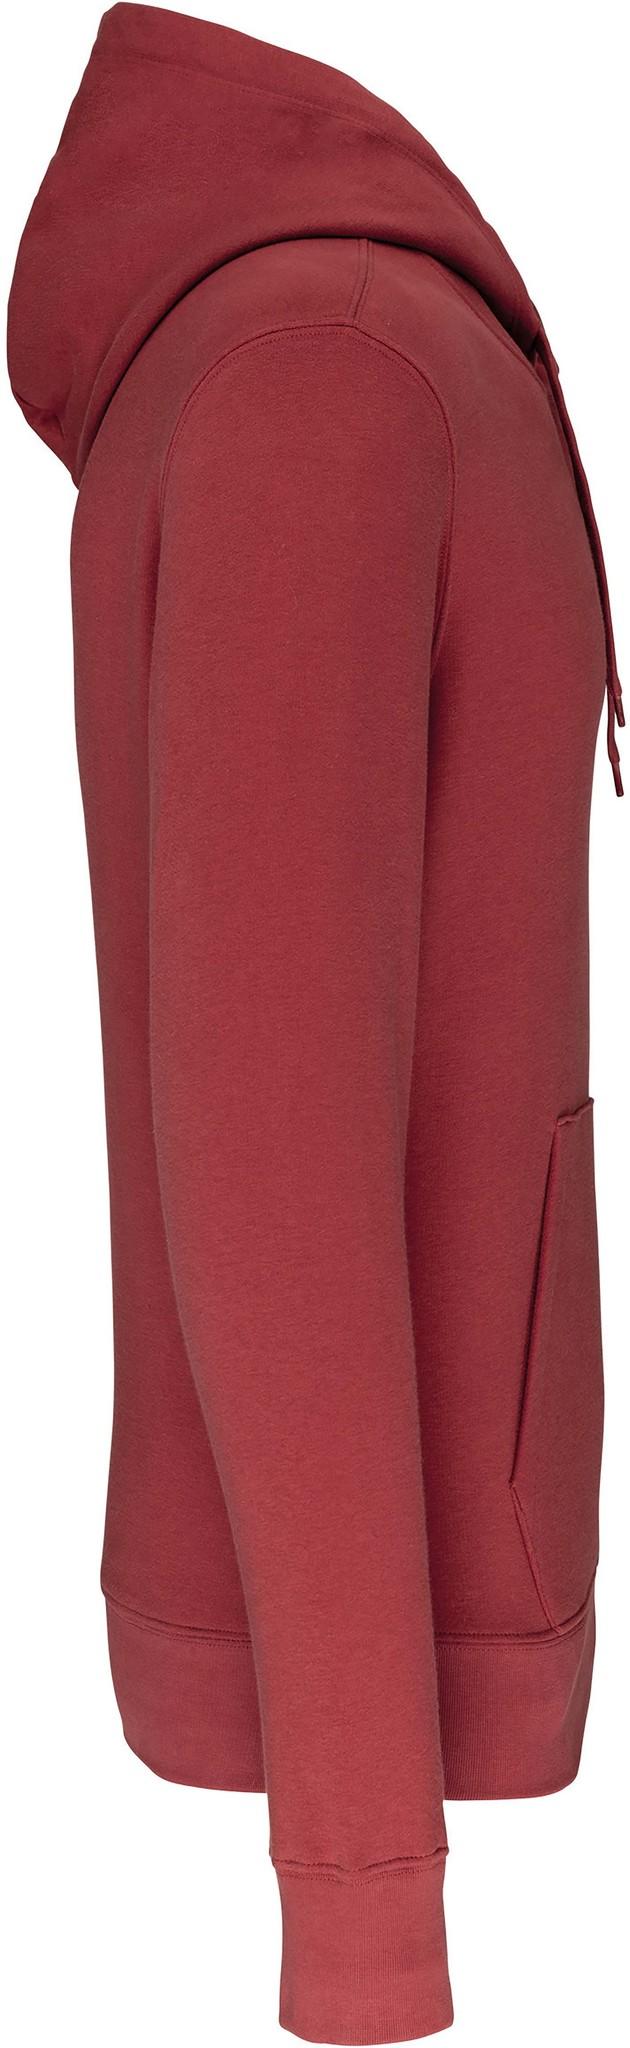 Eco-Friendly Hoodie Uni Terracotta-Red